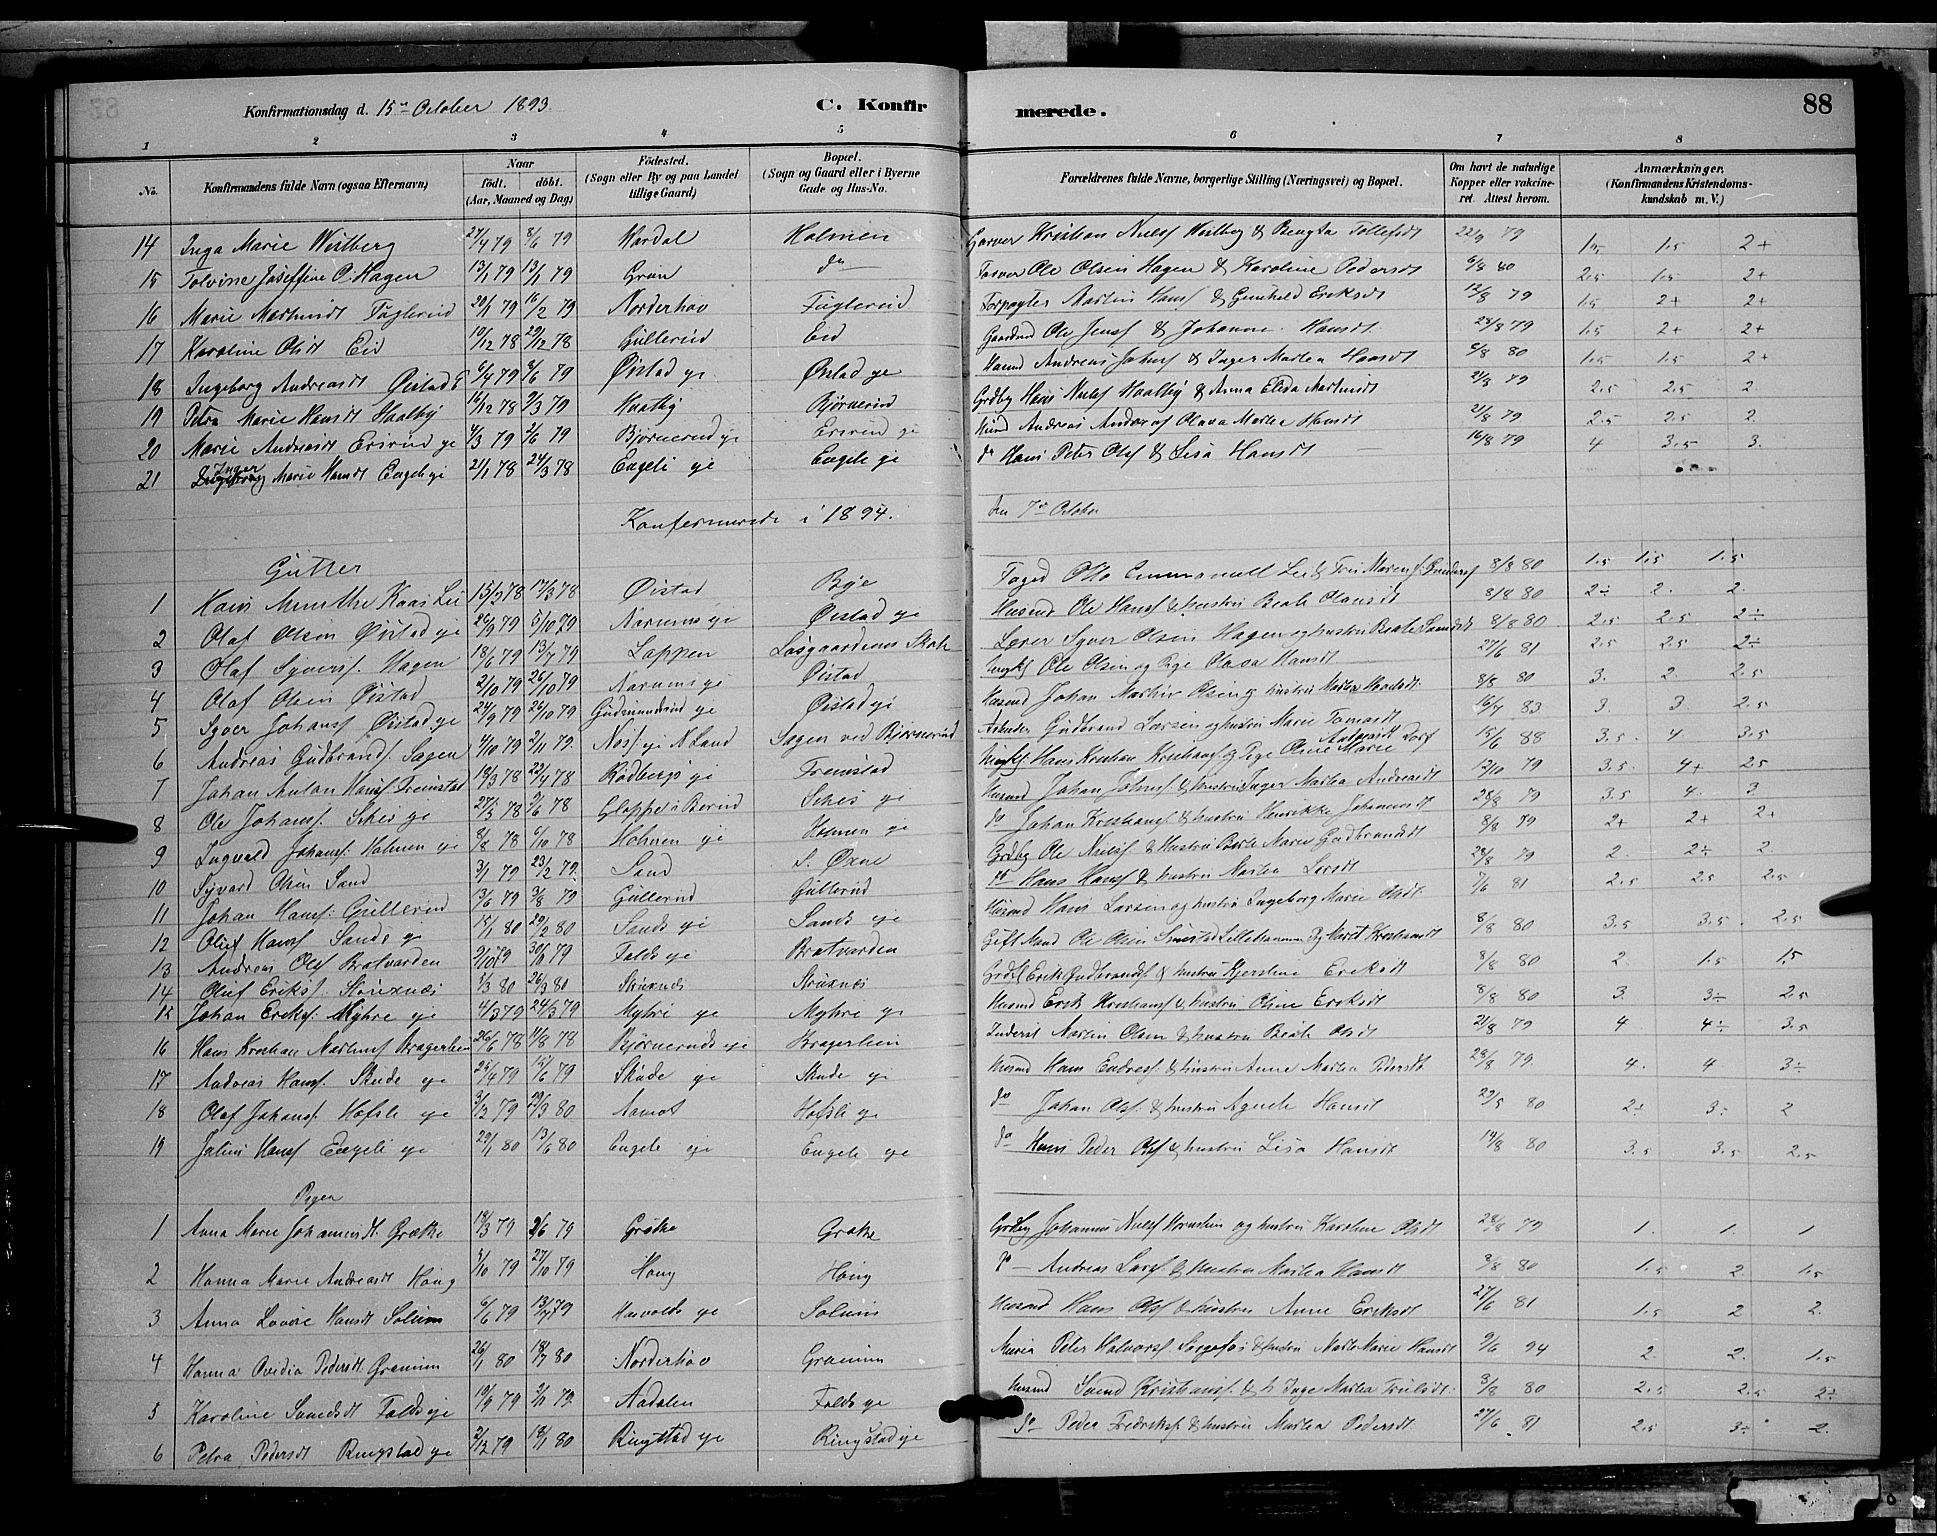 SAH, Søndre Land prestekontor, L/L0002: Klokkerbok nr. 2, 1884-1900, s. 88